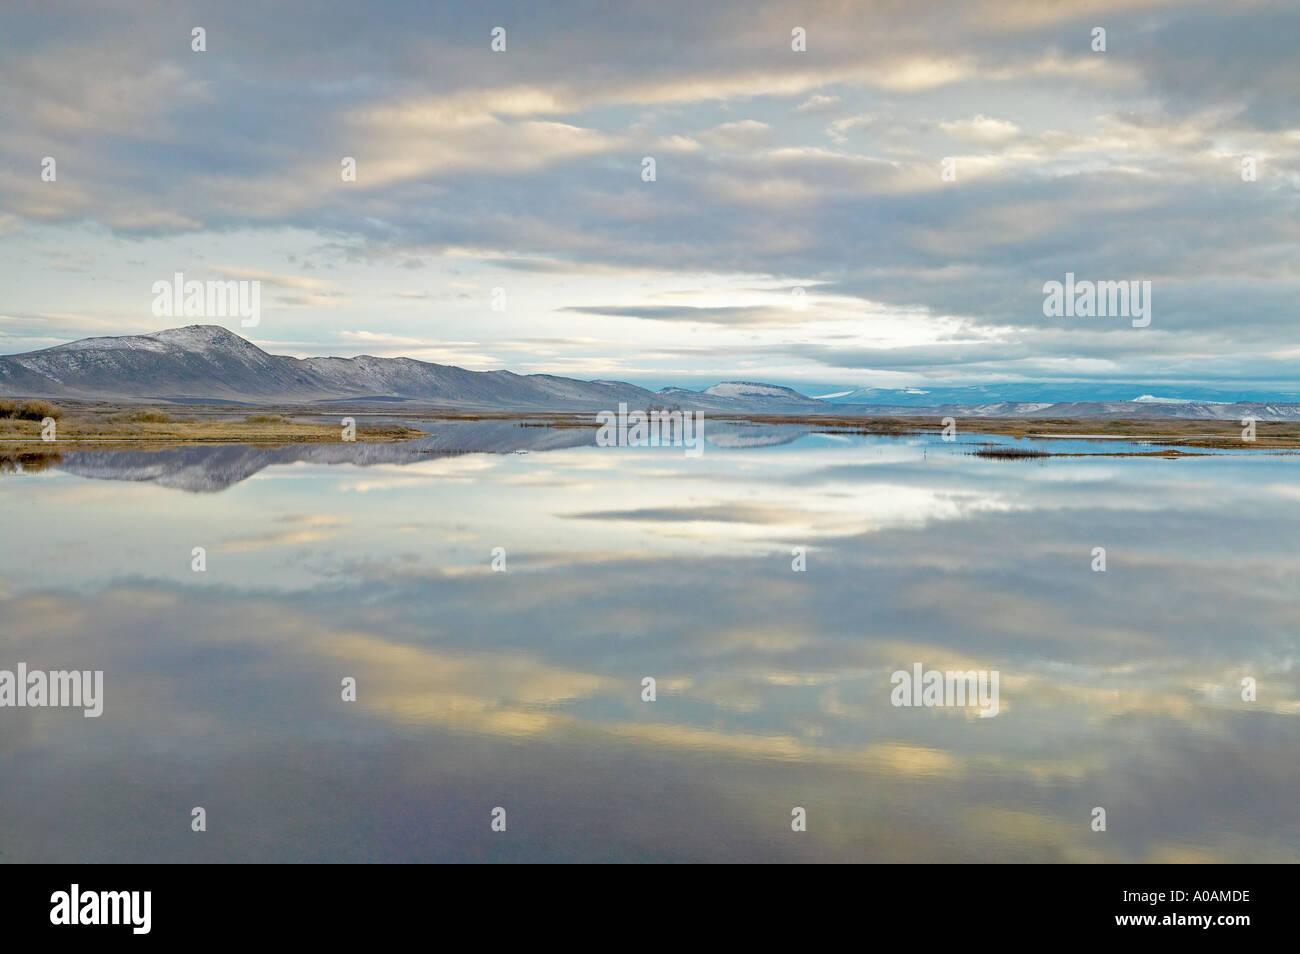 Reflexion im unteren Klamath Lake National Wildlife Refuge Kalifornien Stockbild